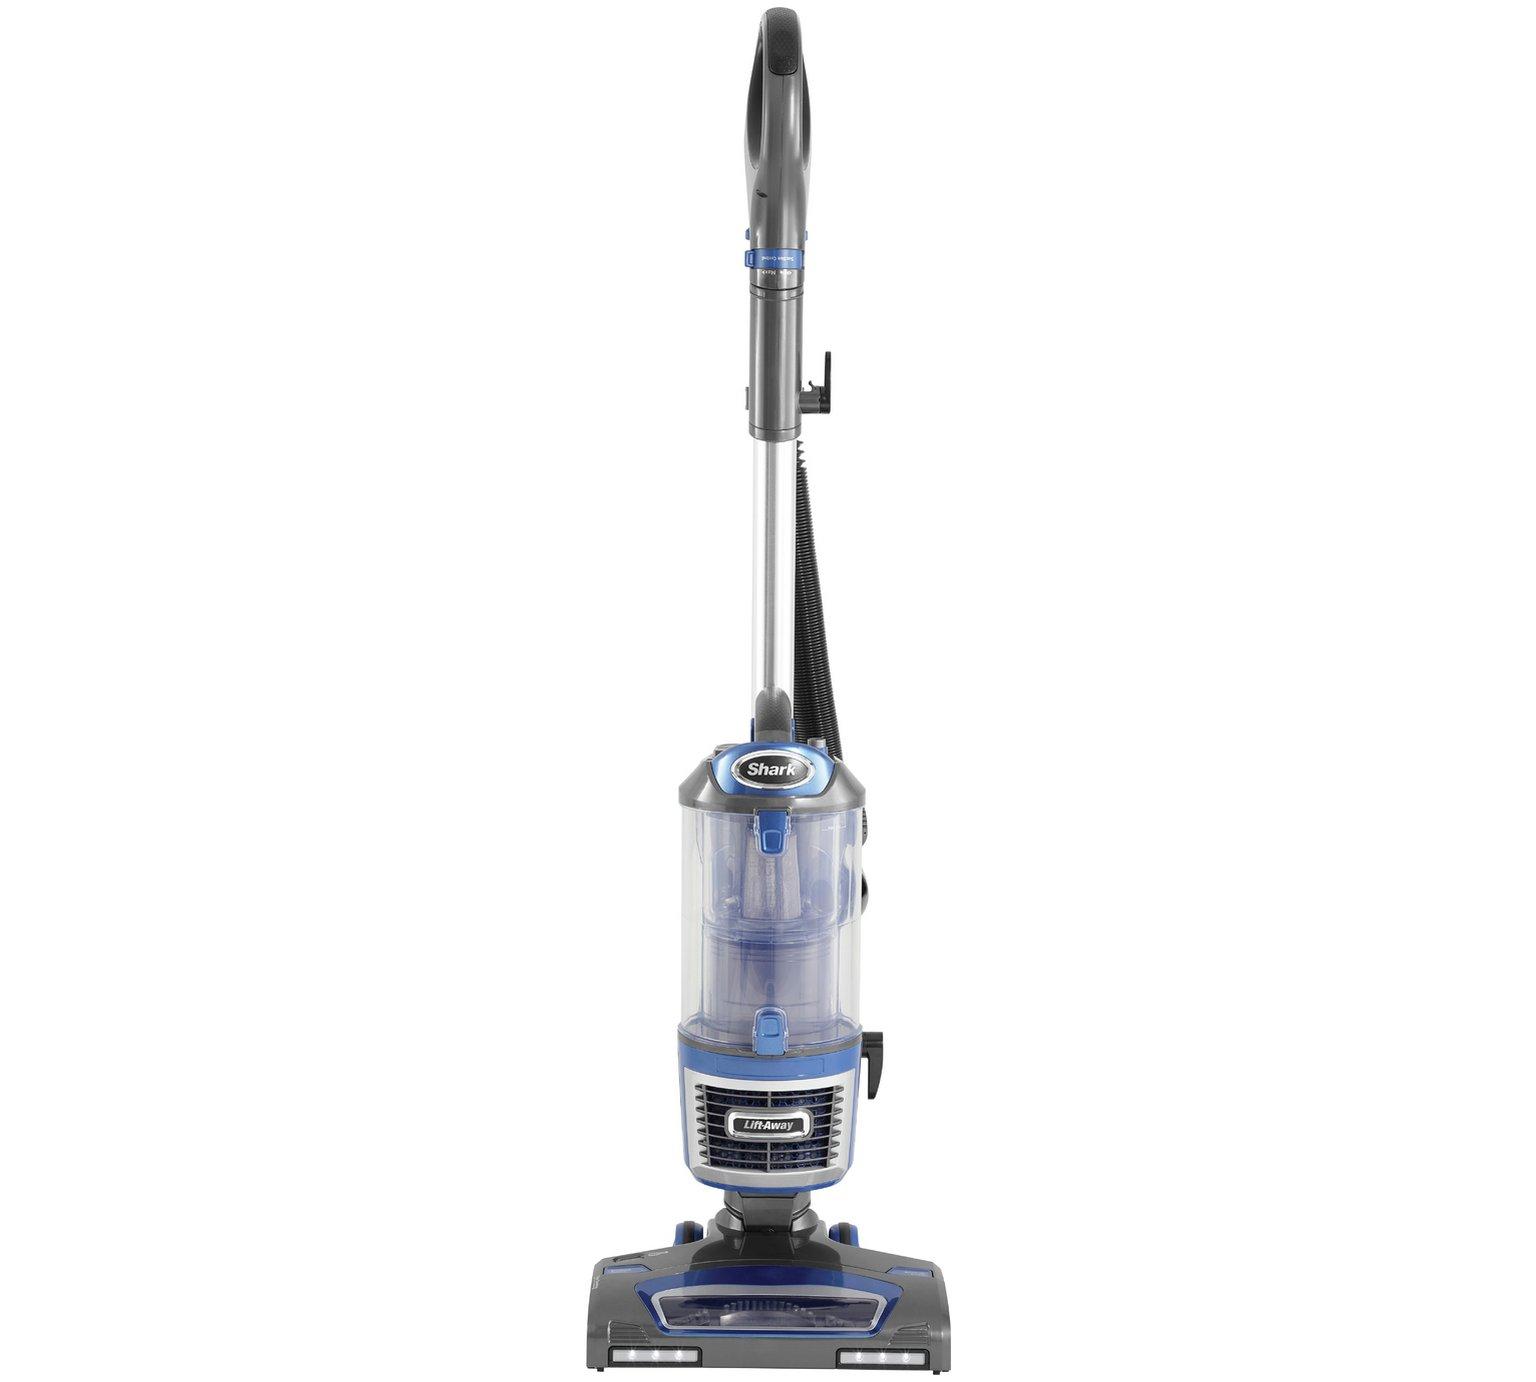 shark nv601uk lift away vacuum cleaner argos. Black Bedroom Furniture Sets. Home Design Ideas